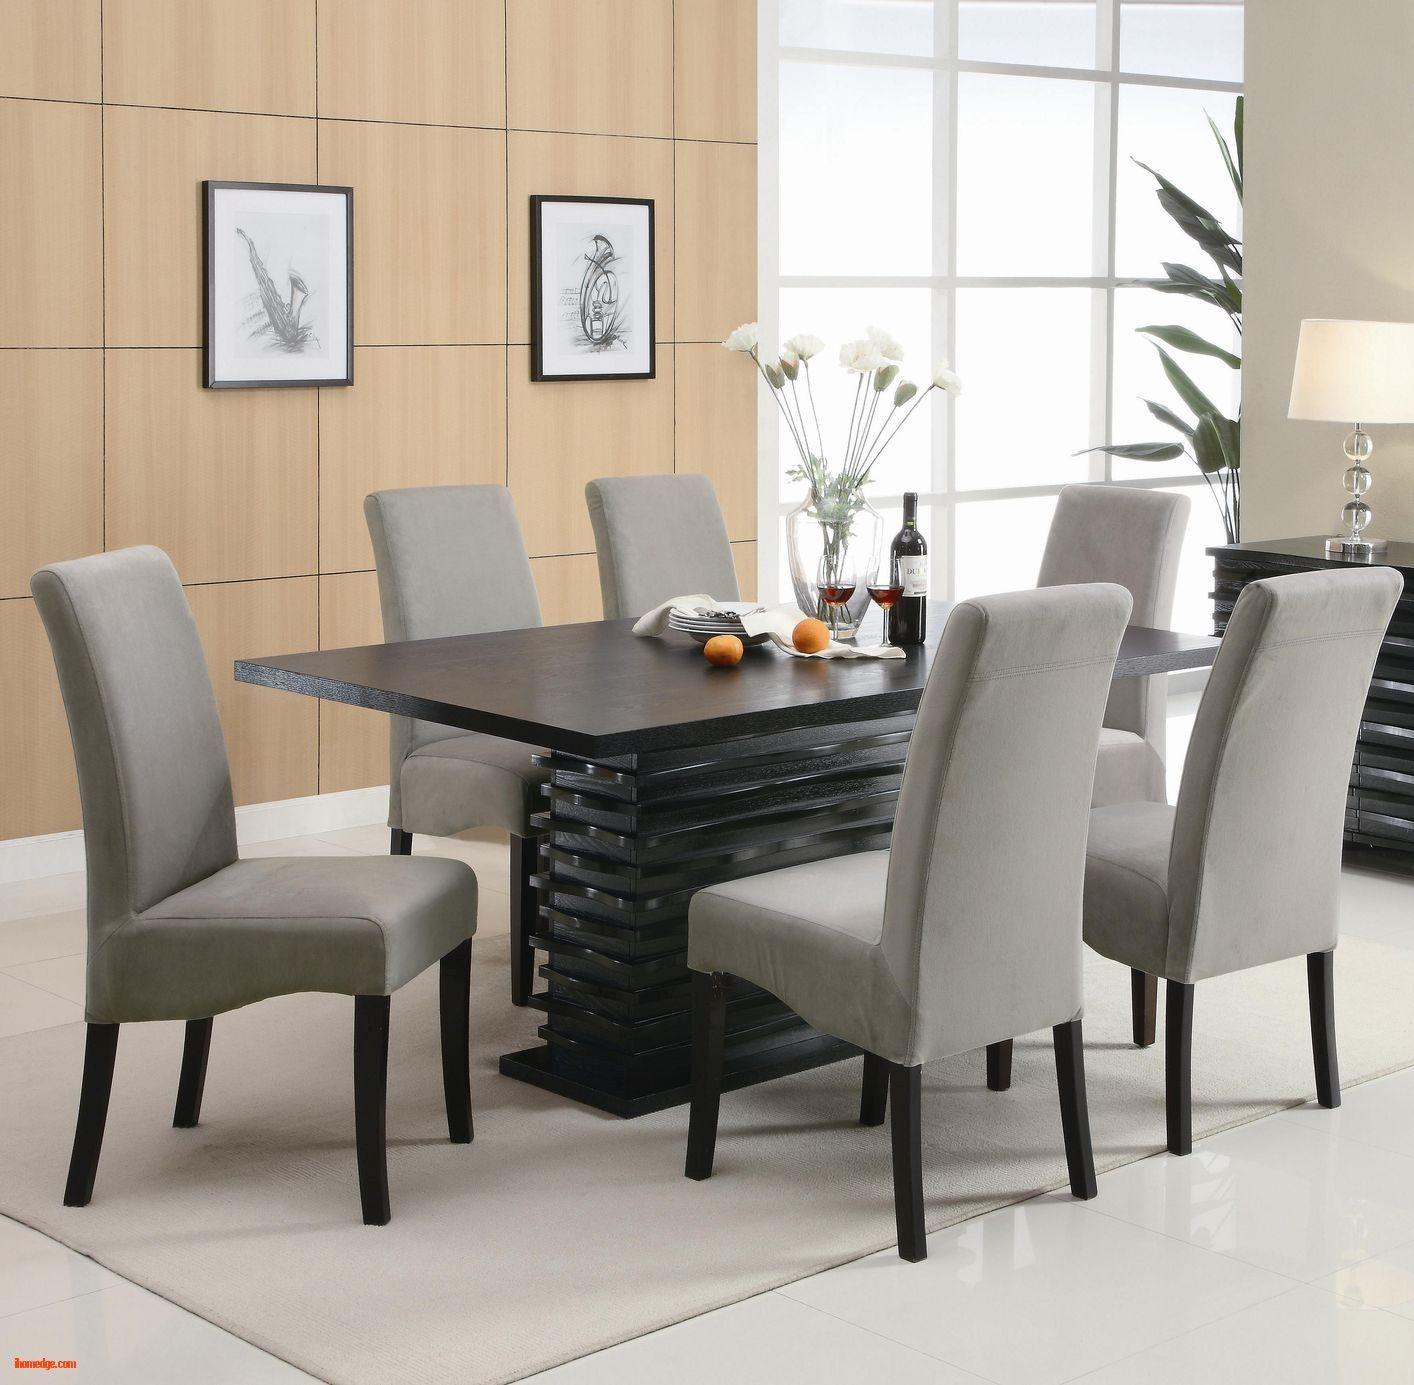 Inspirational Elegant 4 Dining Room Chairs  Dining Room Chairs Fascinating Dining Room Chair Set Of 4 Inspiration Design